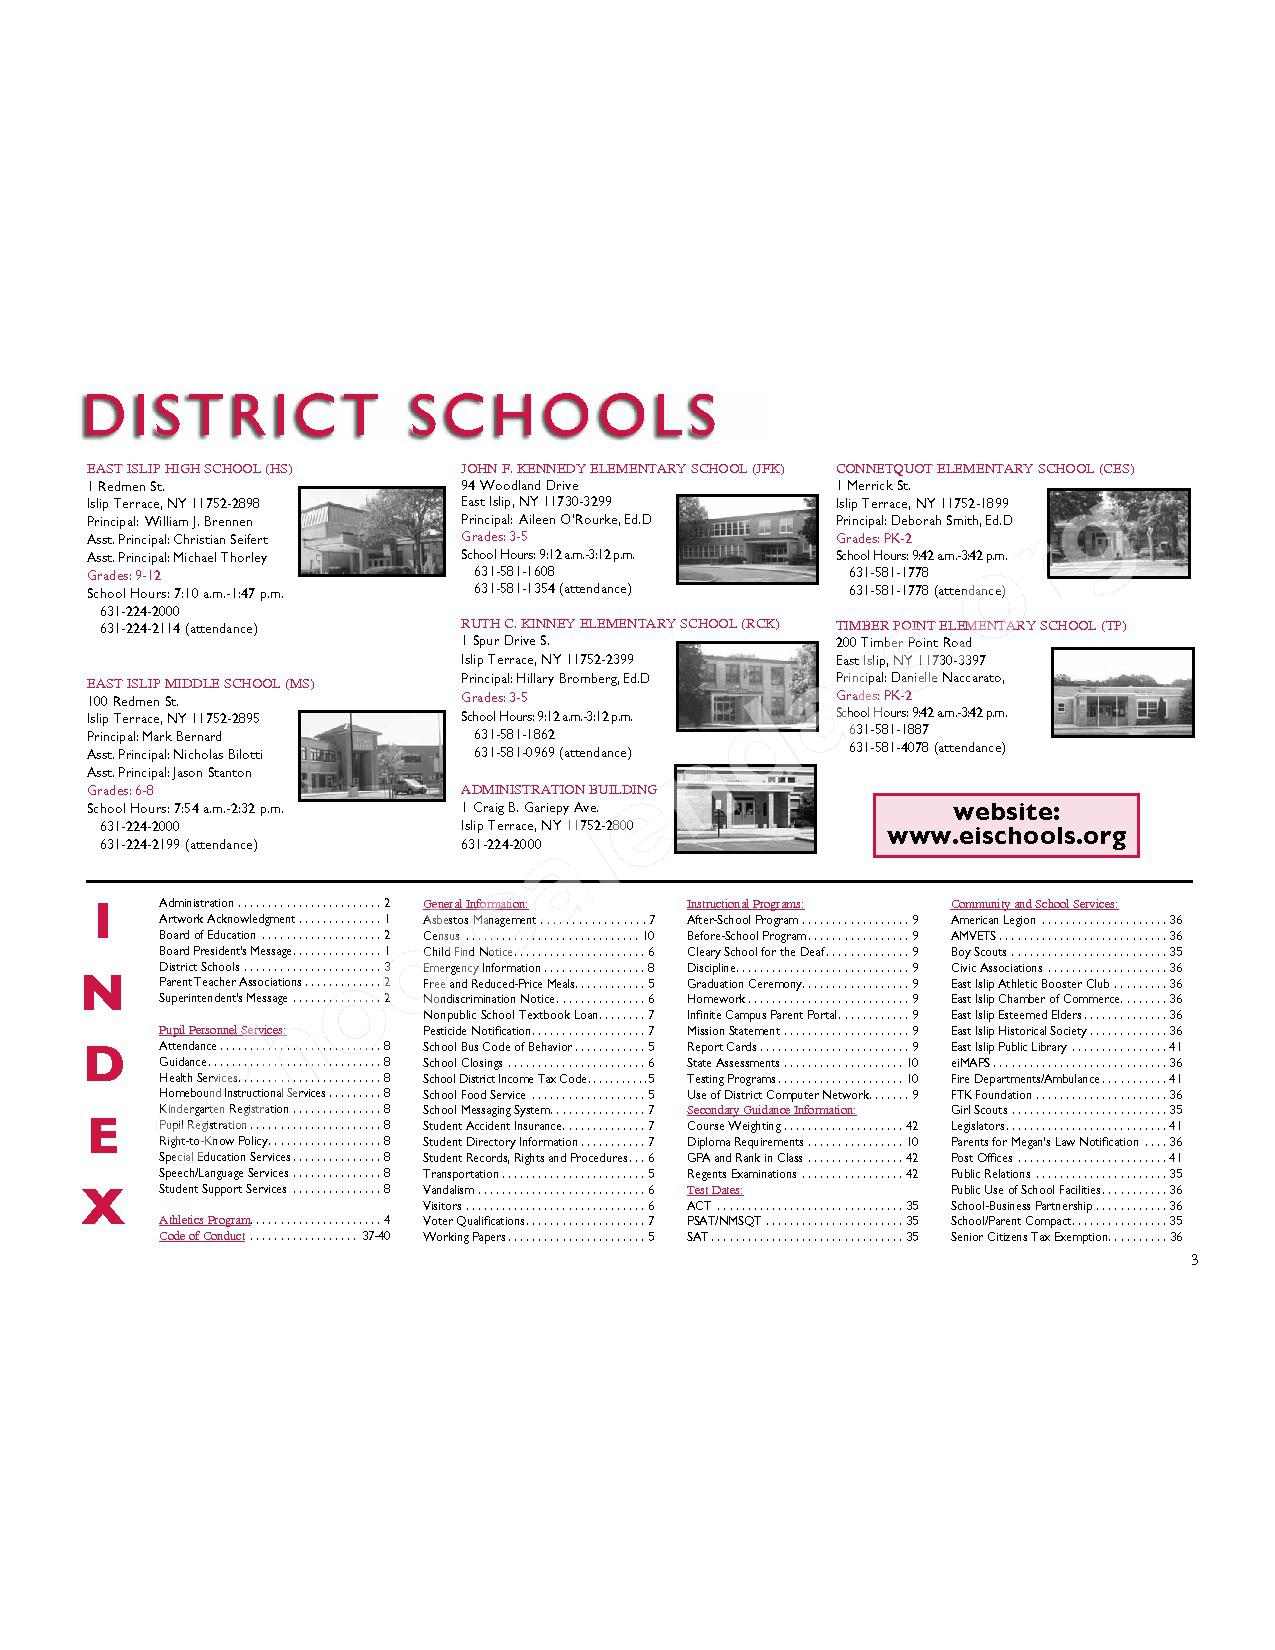 2016 - 2017 District Calendar | East Islip Union Free School throughout East Islip School District Calendar